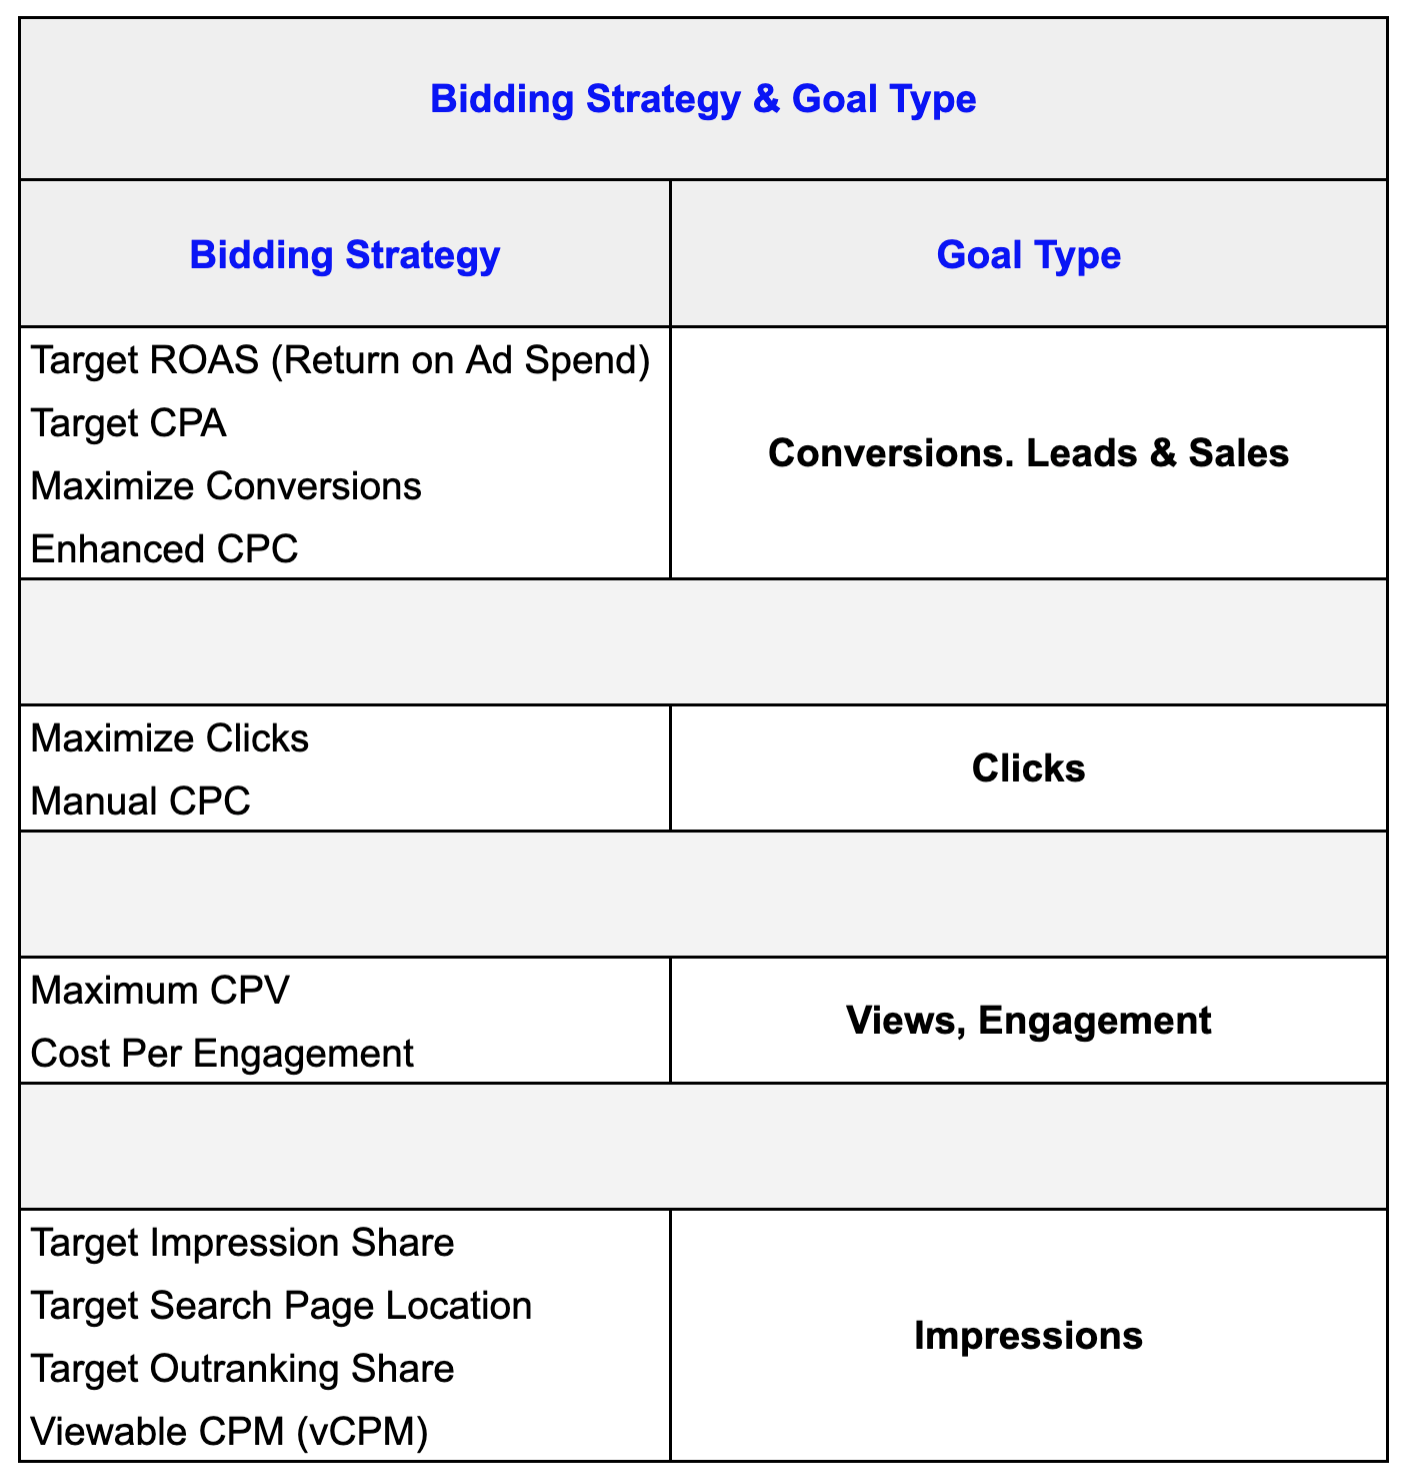 Google Ads Bidding Strategies & Goal Types